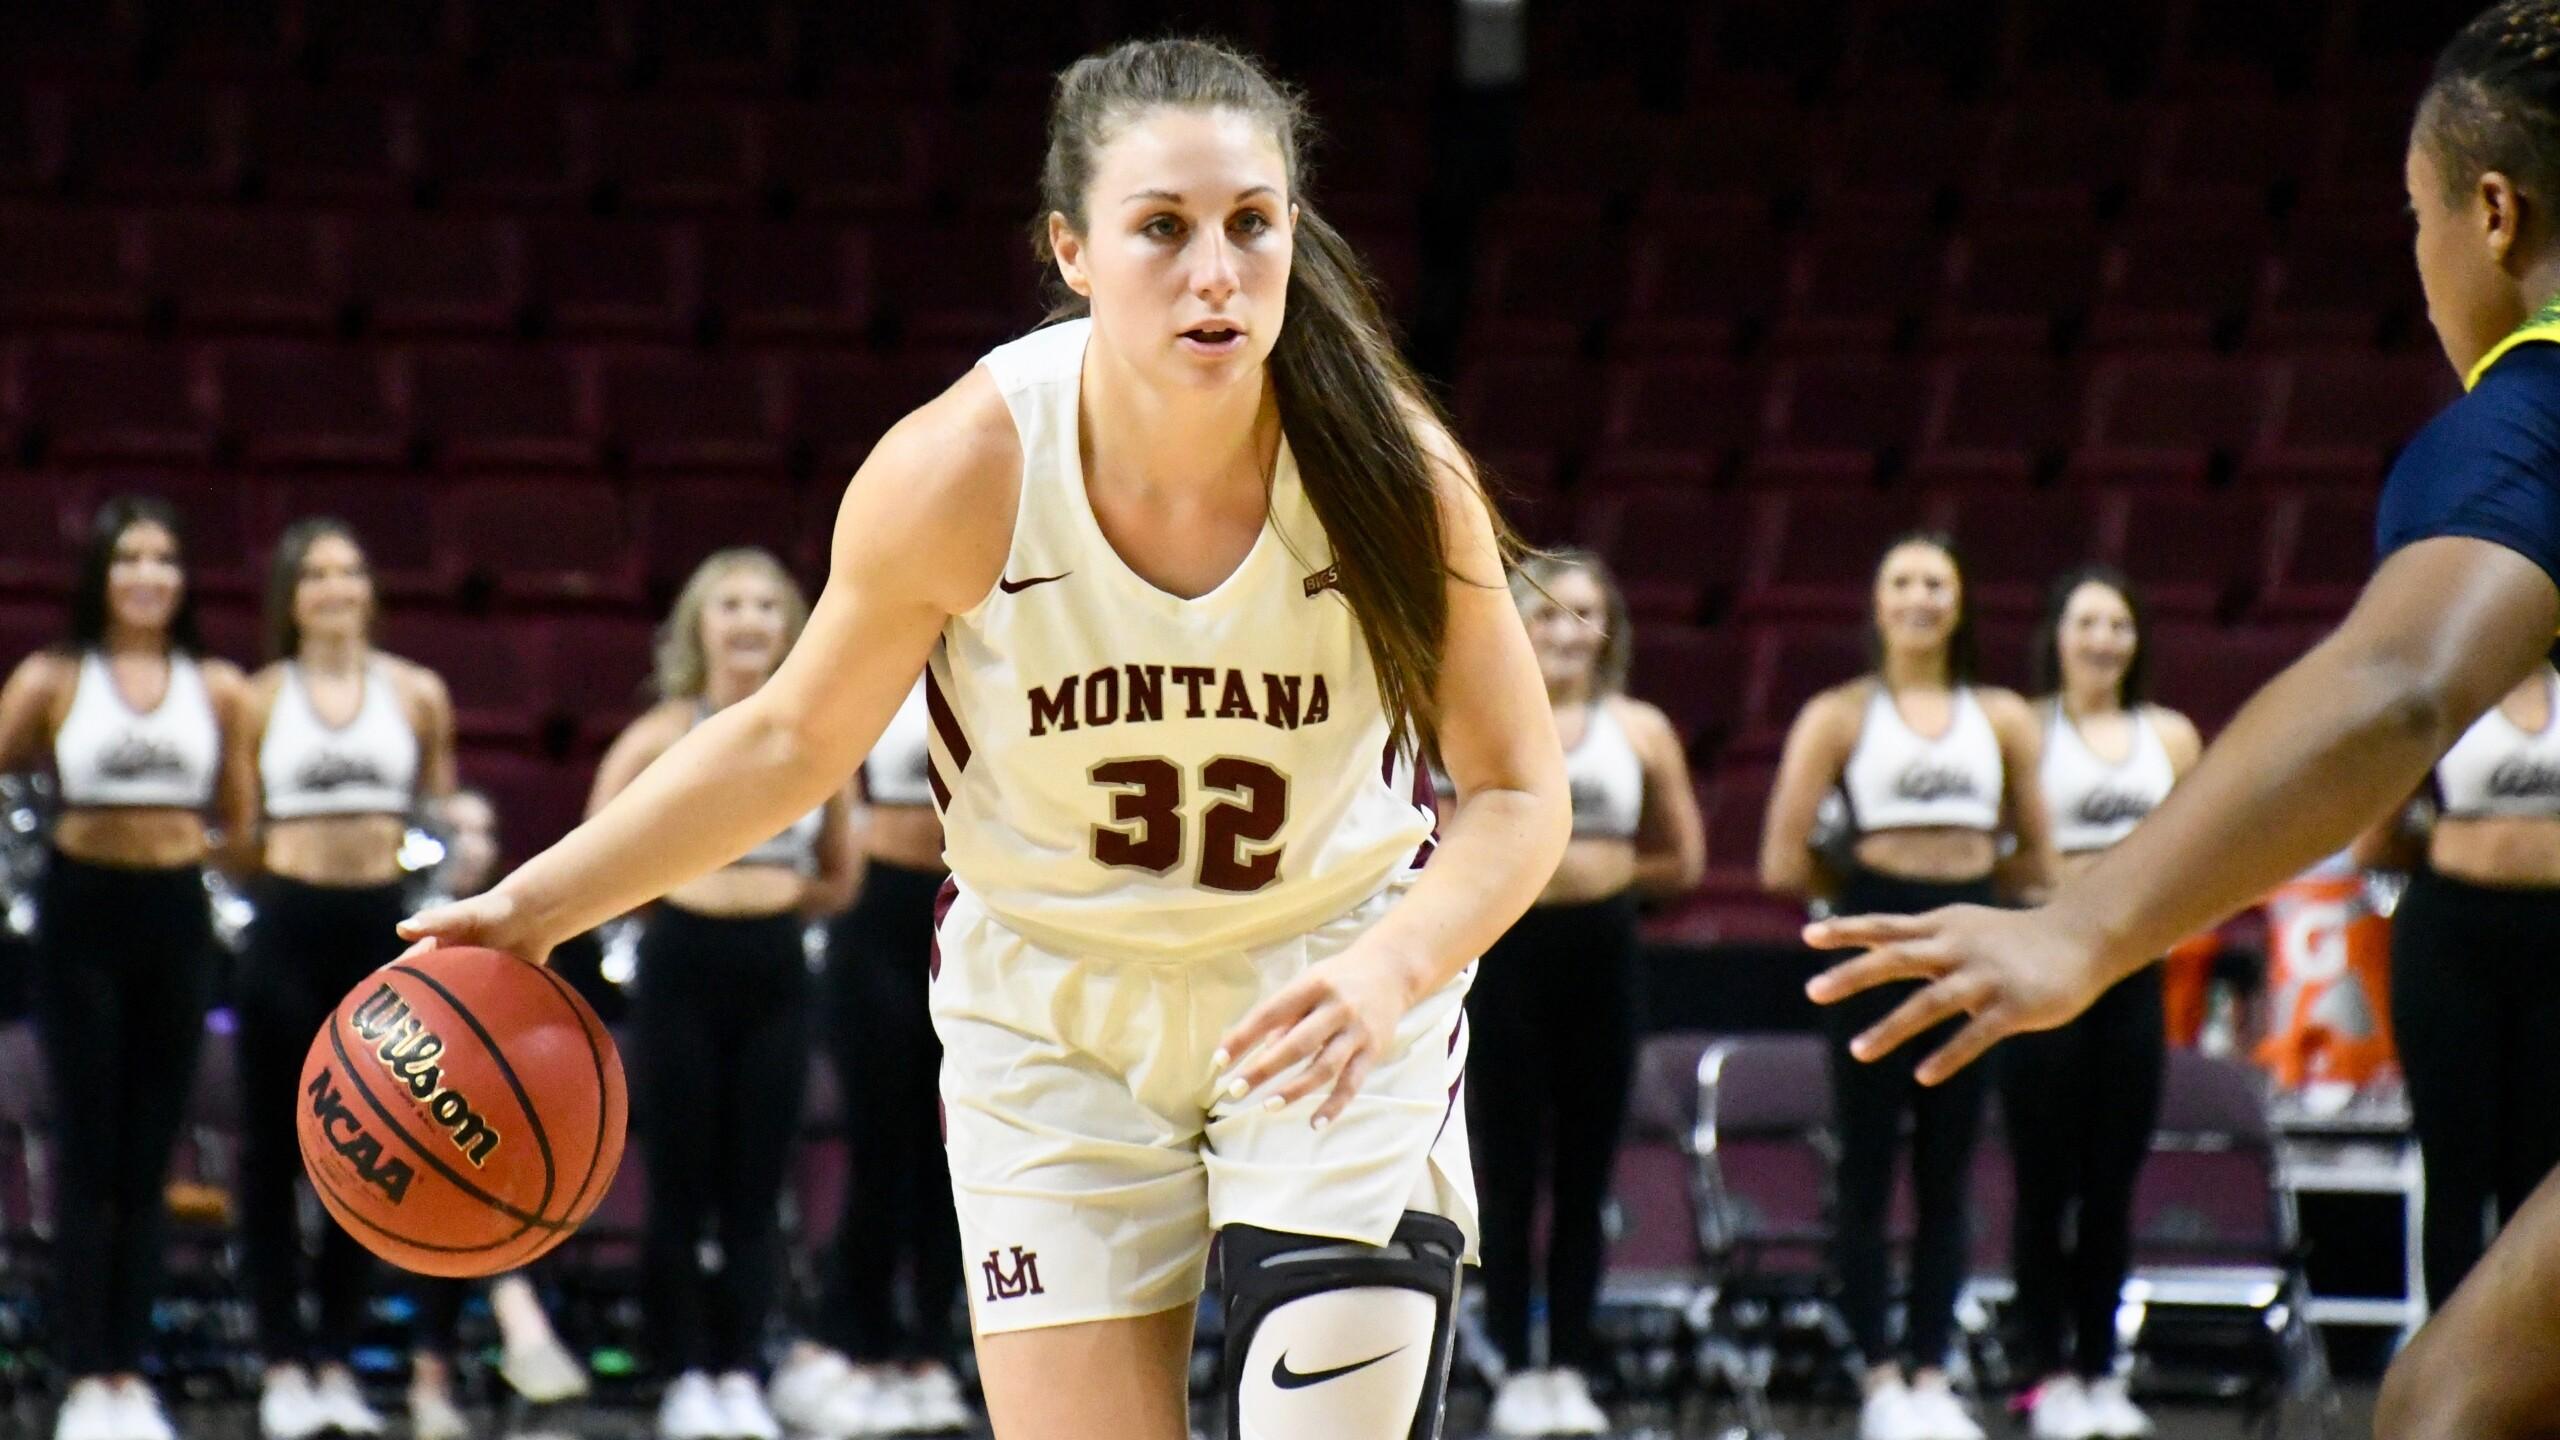 Montana vs. Northern Arizona - Big Sky Conference women's basketball quarterfinals